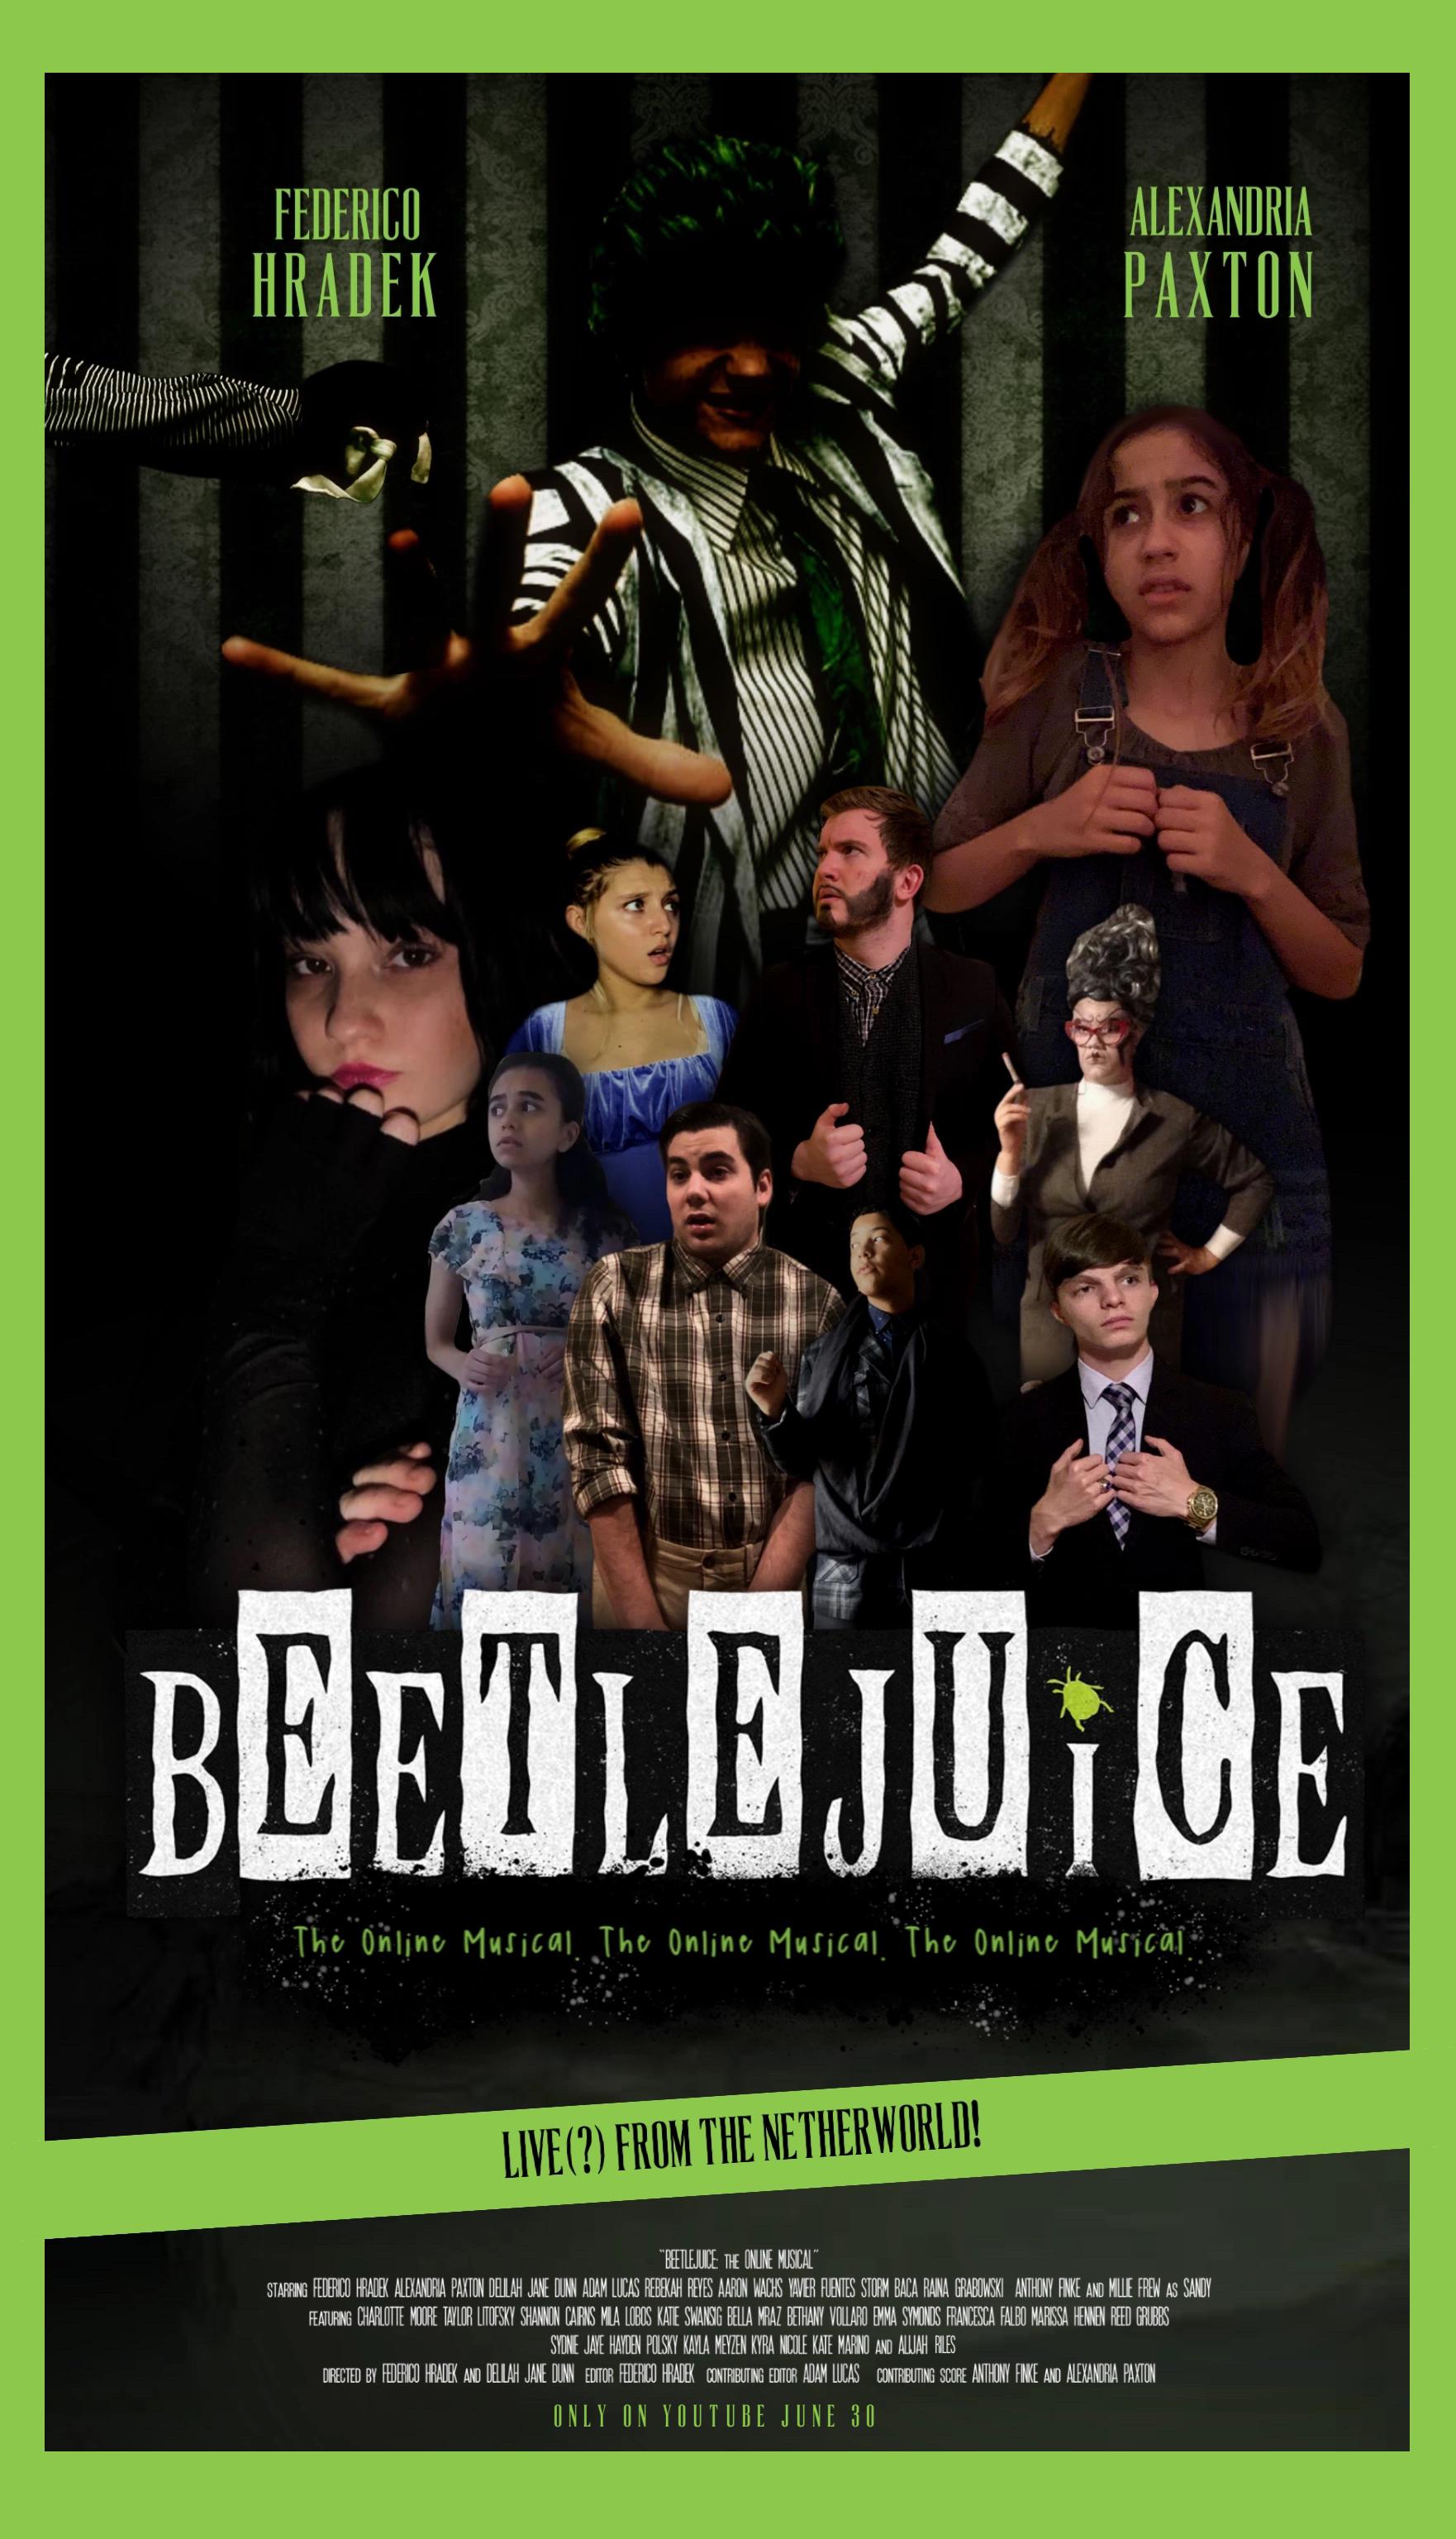 Beetlejuice The Online Musical Video 2020 Imdb